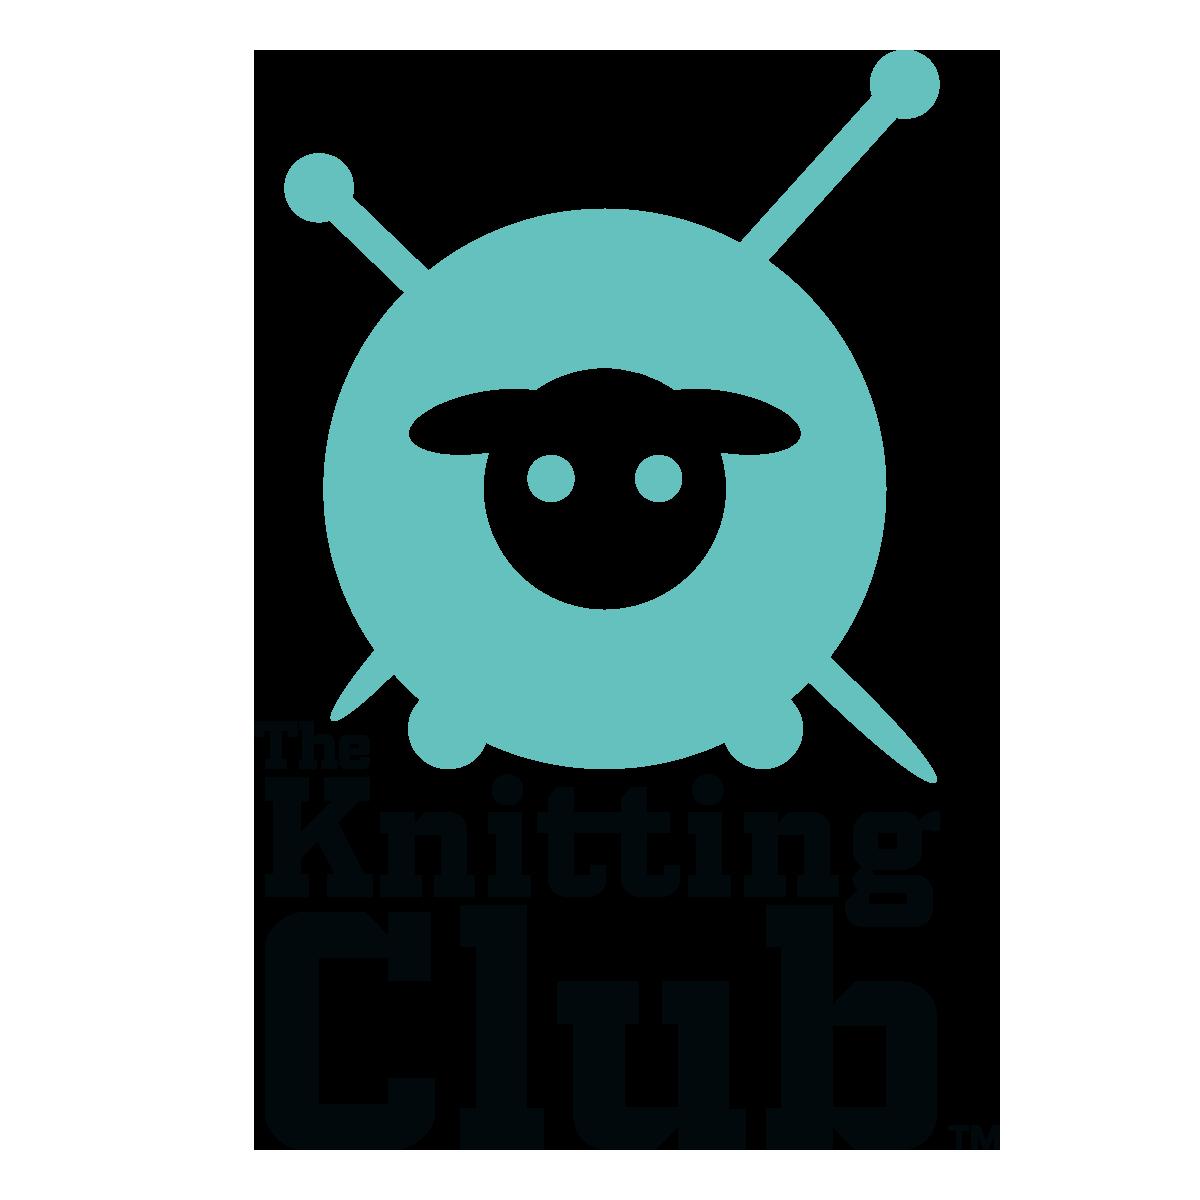 Knitting Club Logo : Κέντημα the knitting club